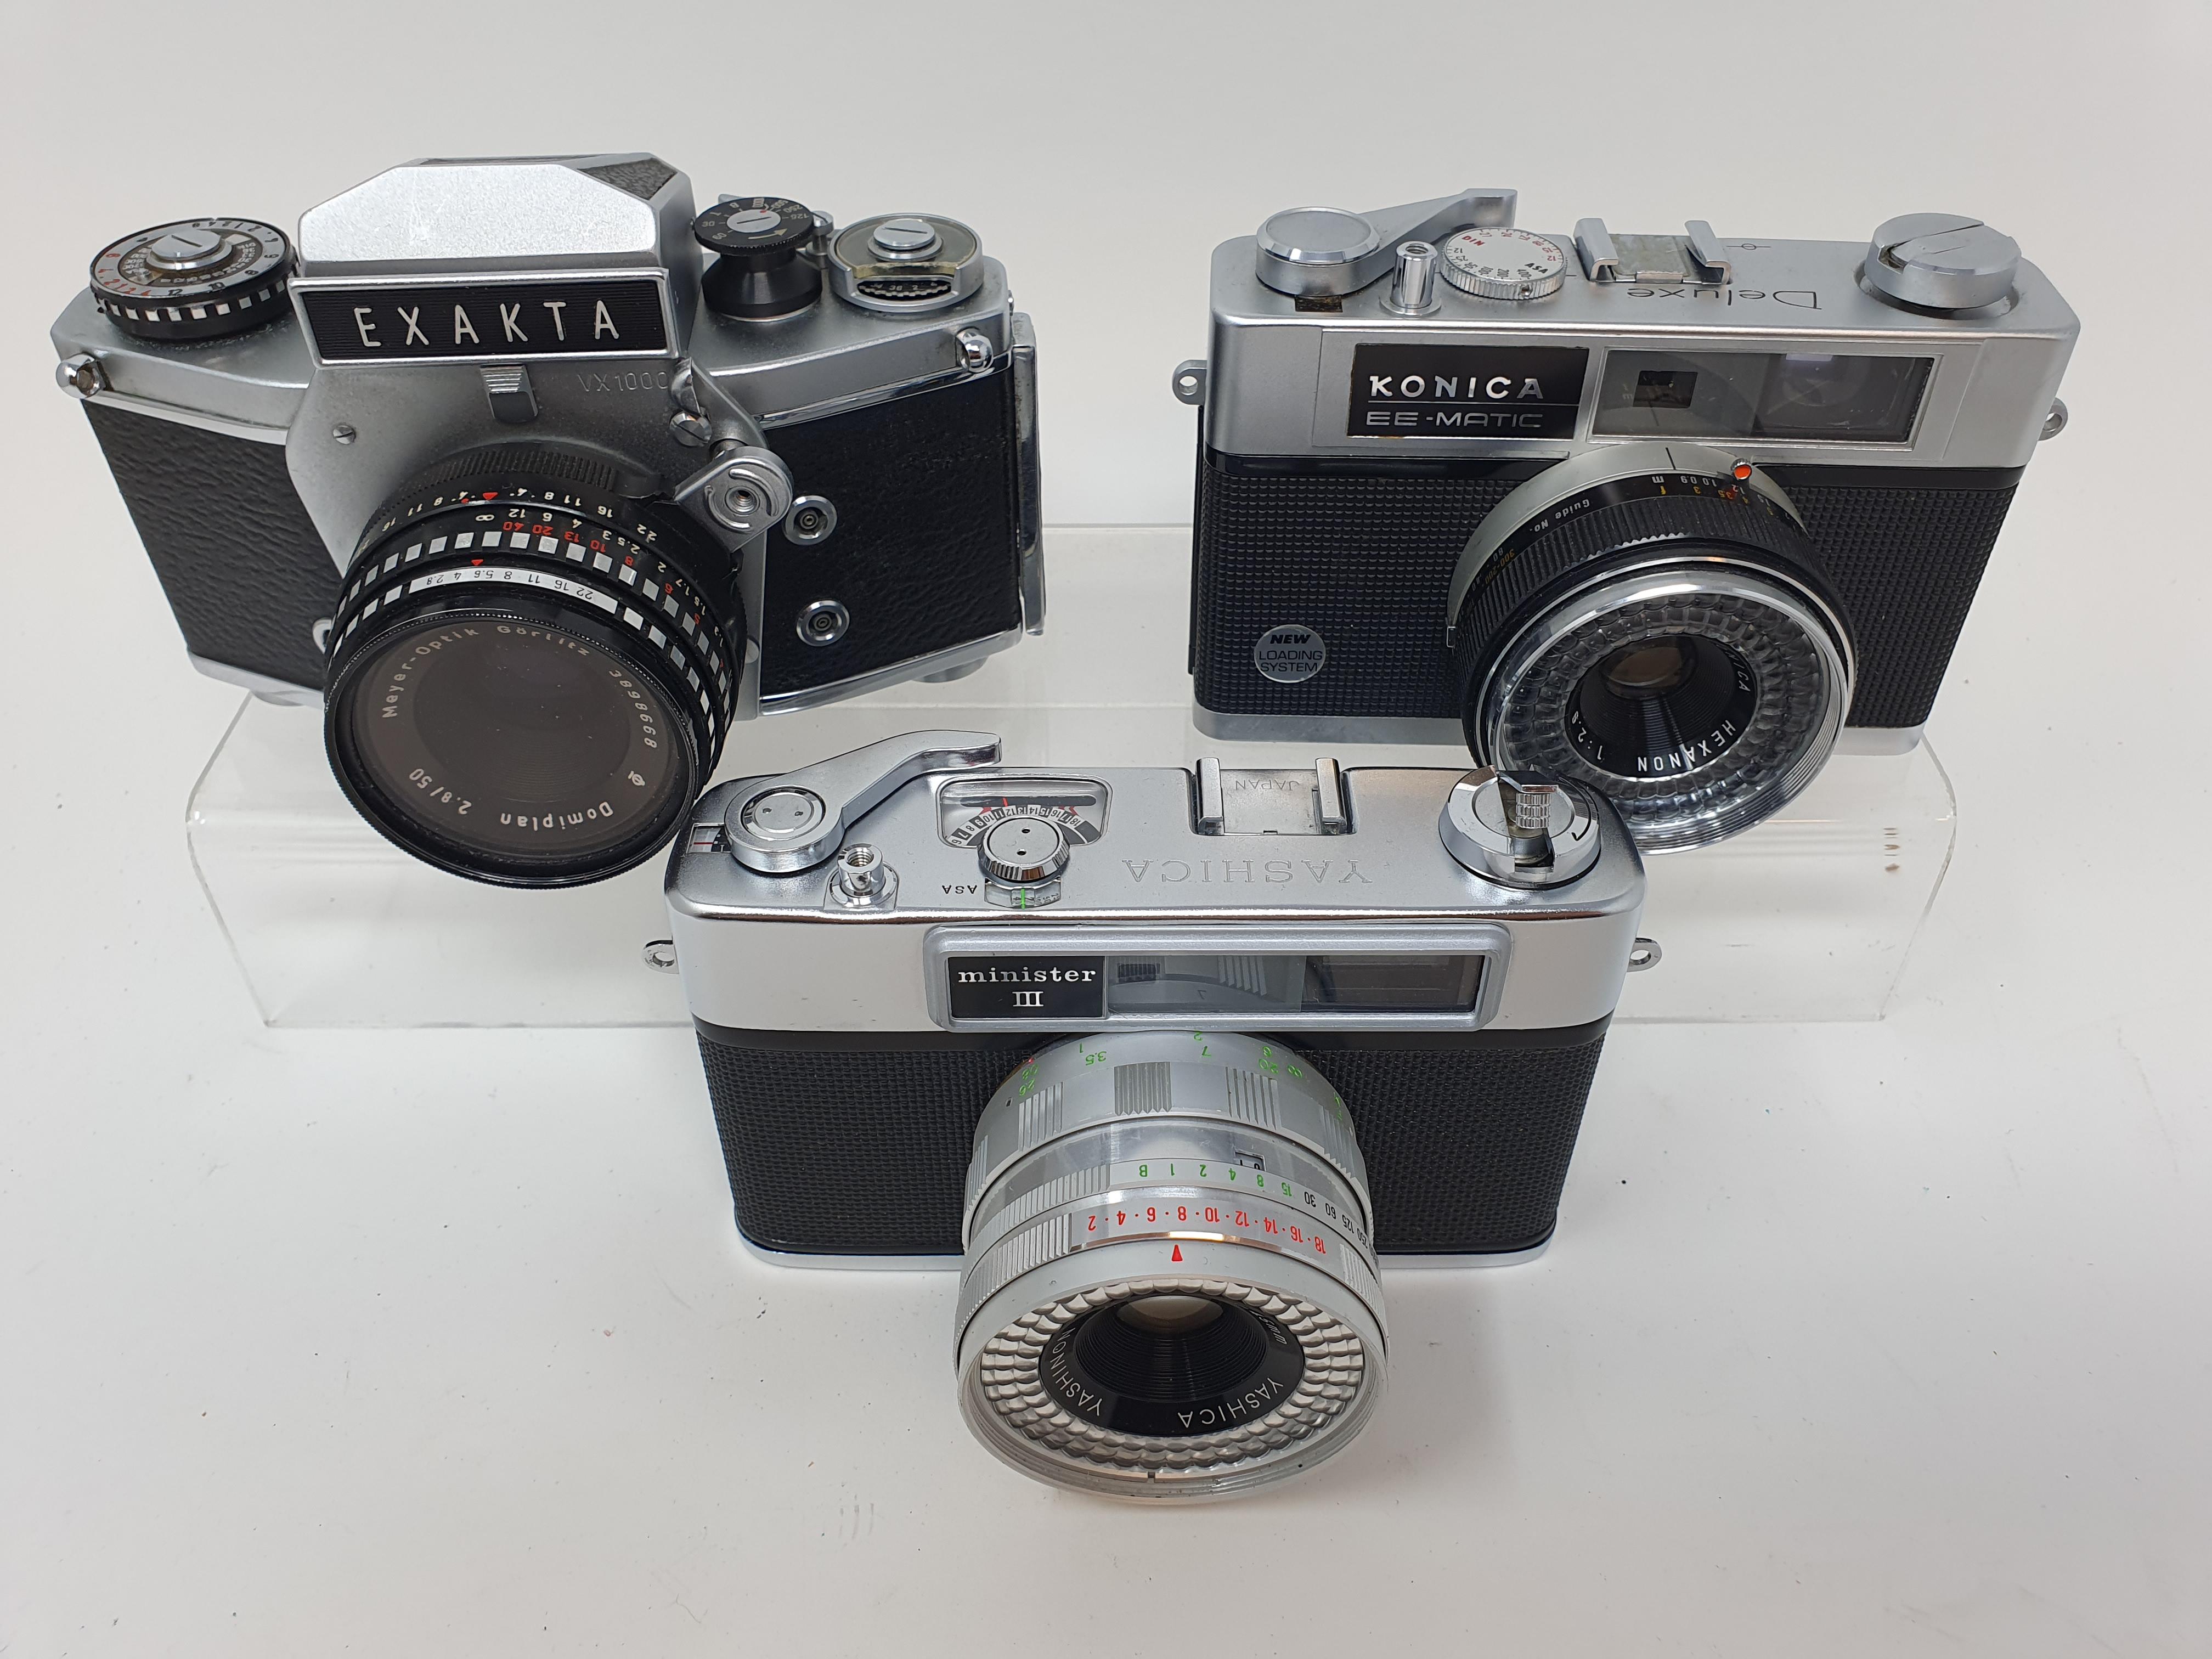 An Exakta VX 1000 camera, a Konica EE-Matic camera and a Yashica Minster III camera (3) - Image 2 of 2